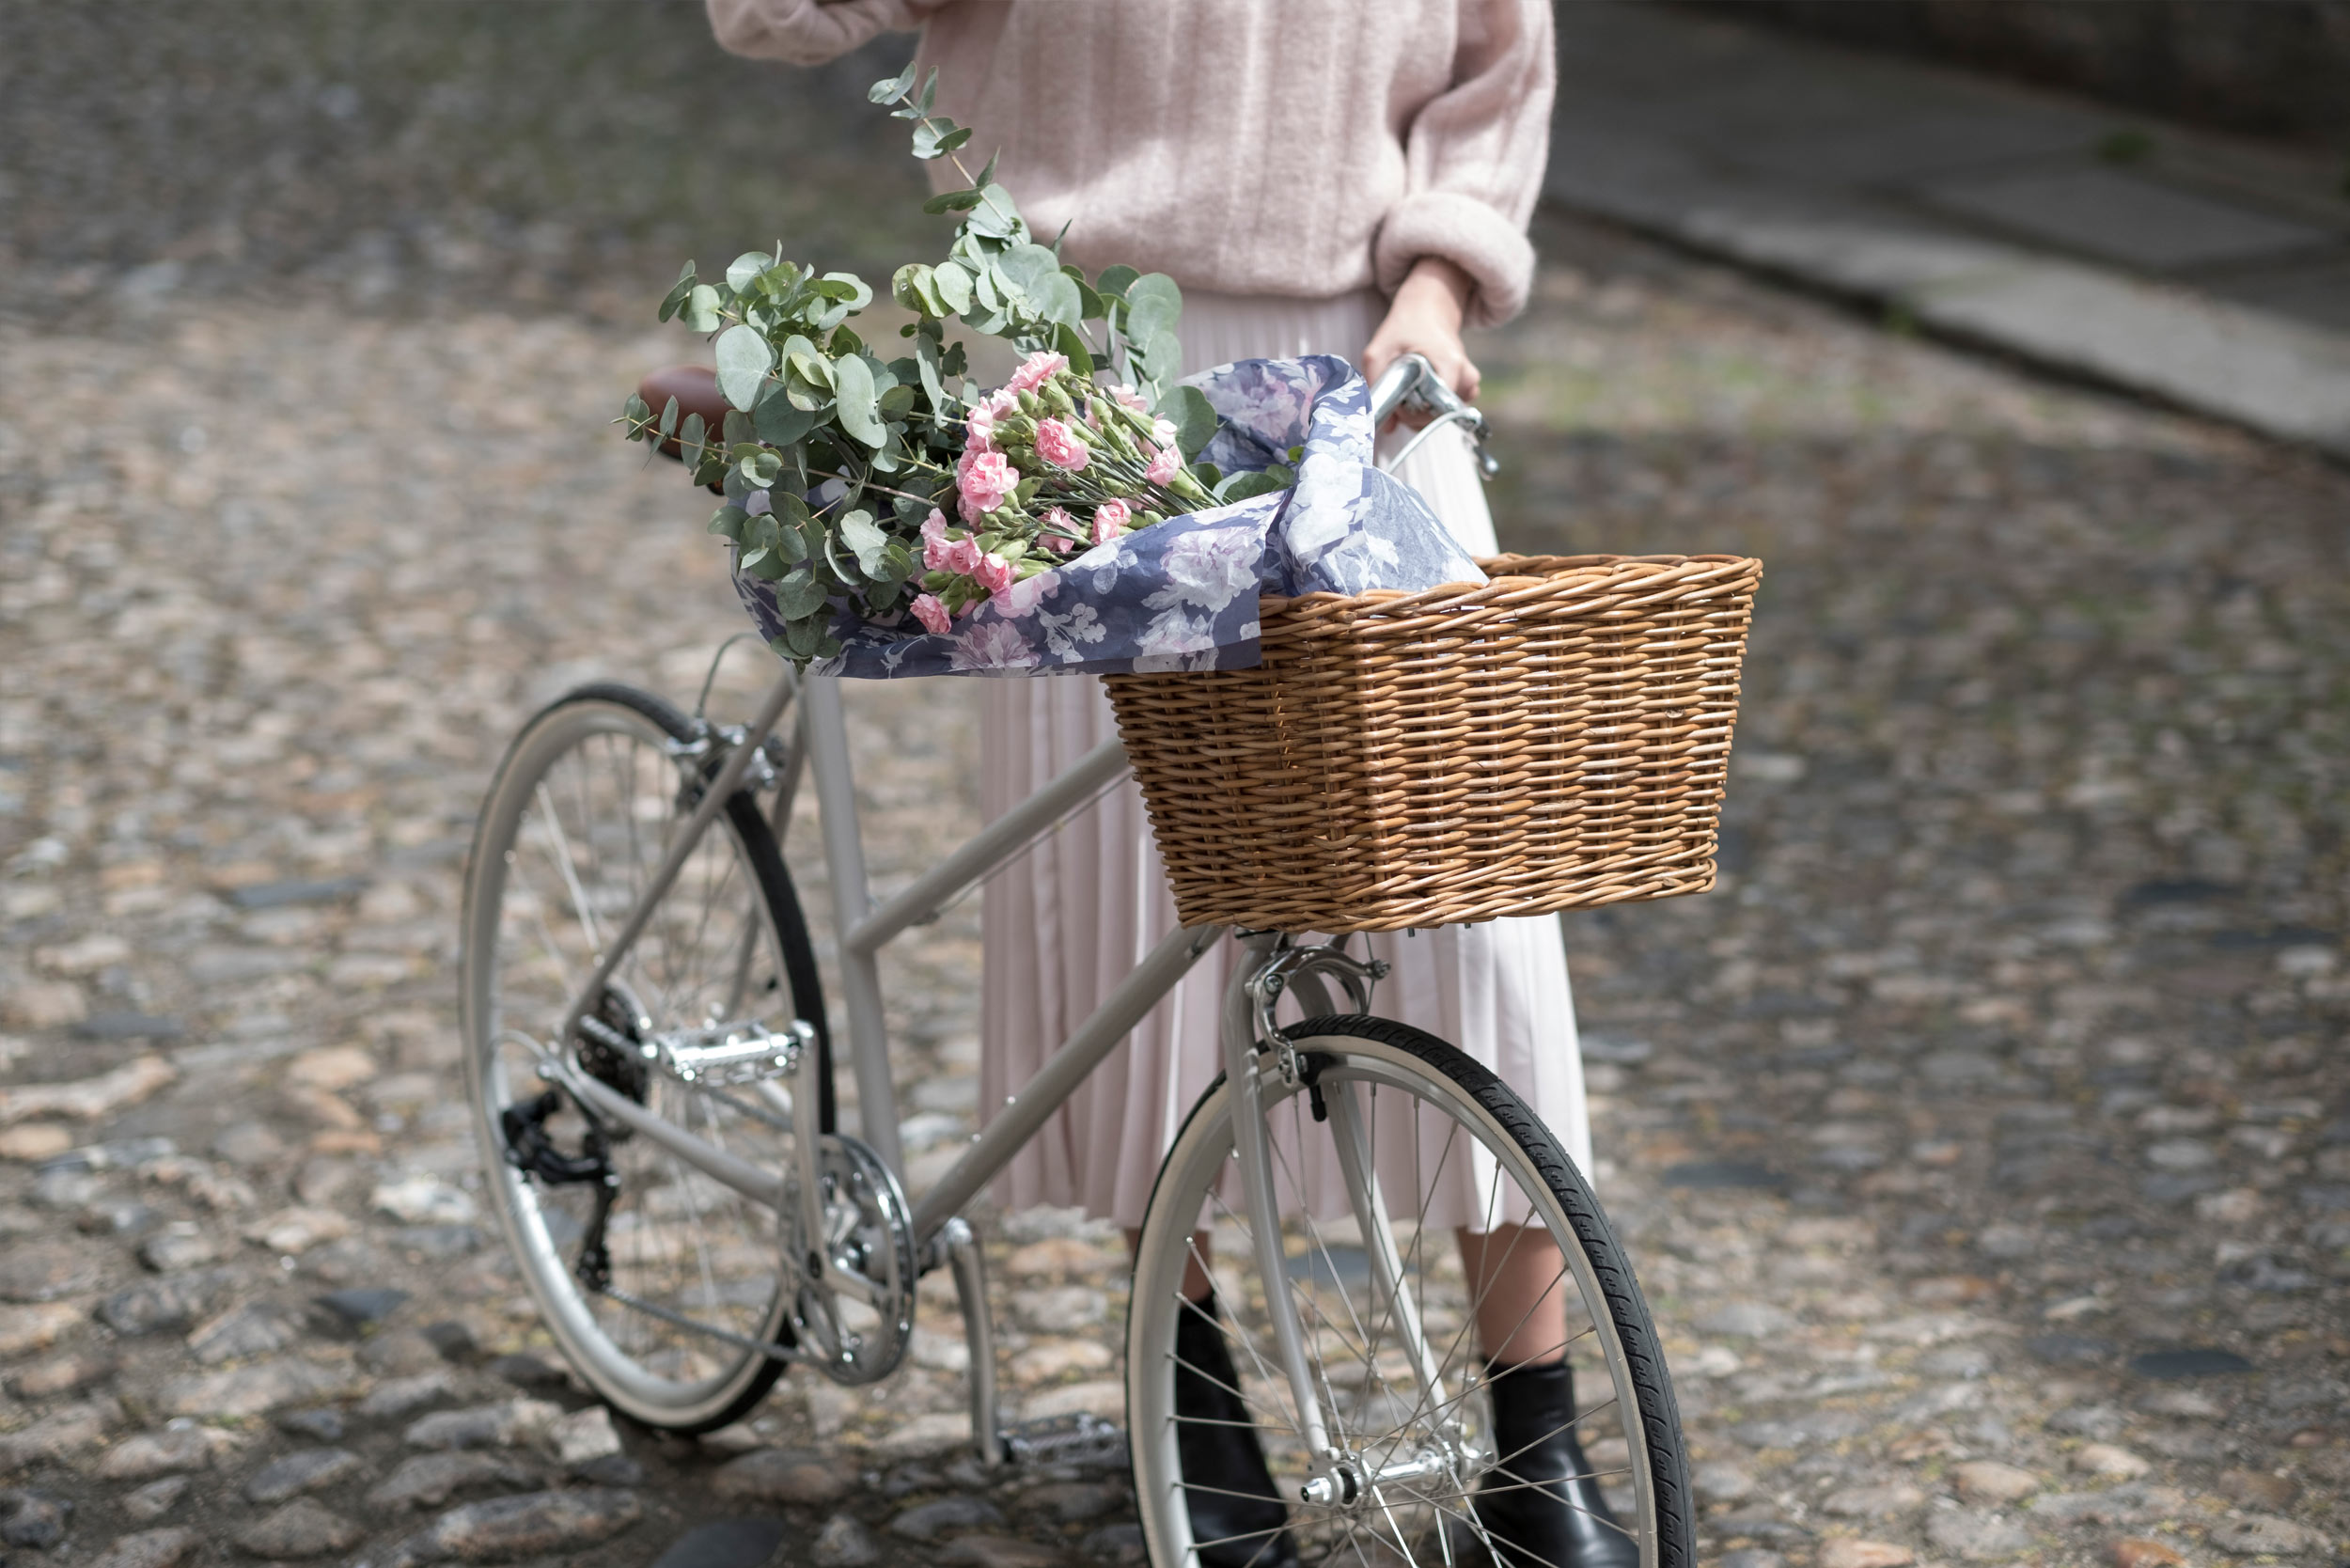 tokyobike-London-Fiona-Burrage-Bike-Norwich-Photographer-Pink-Flowers.jpg